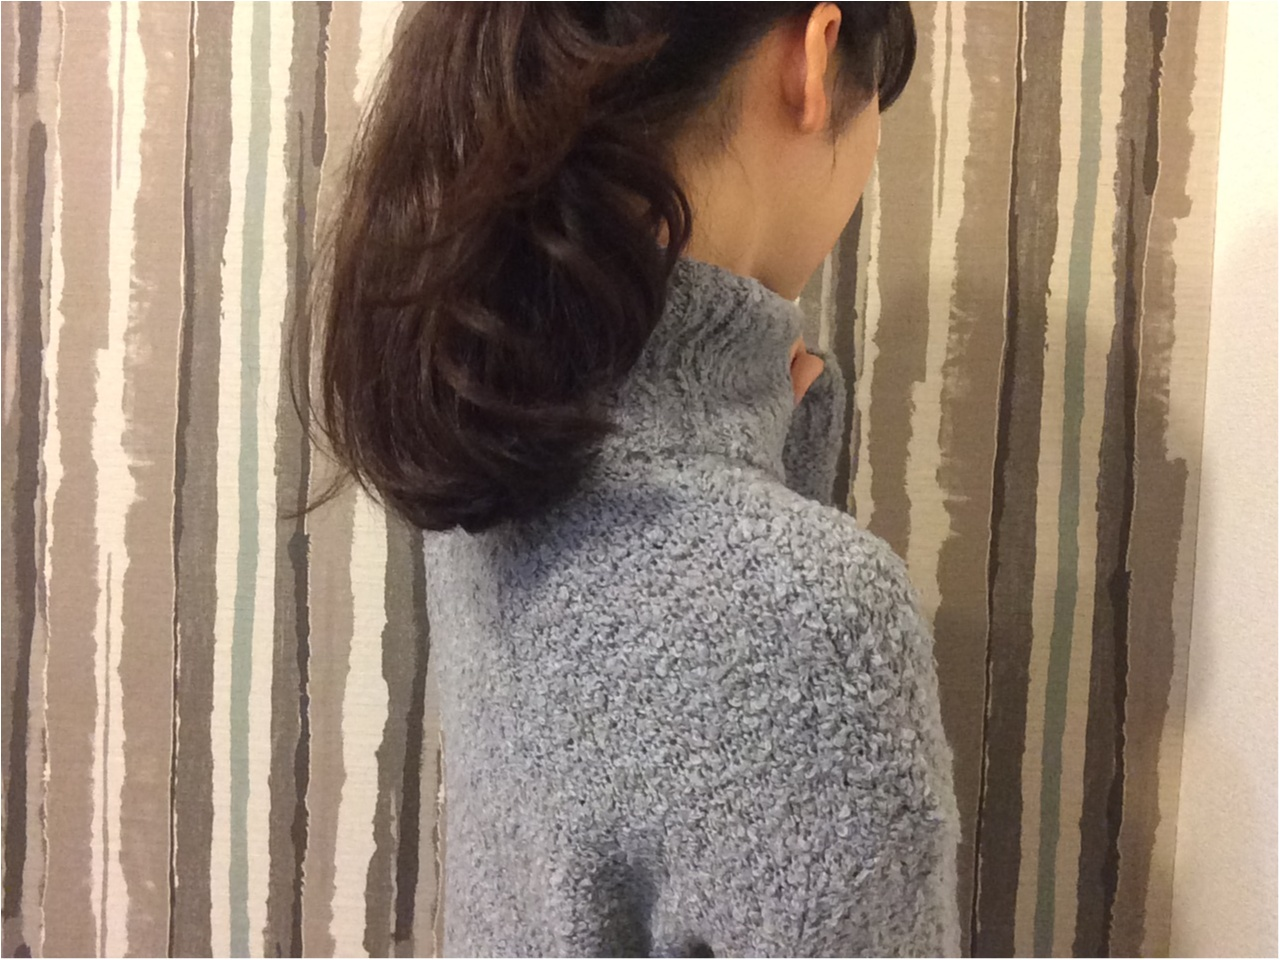 【GU】フワモコセーターで寒い冬に備えよう♡_3